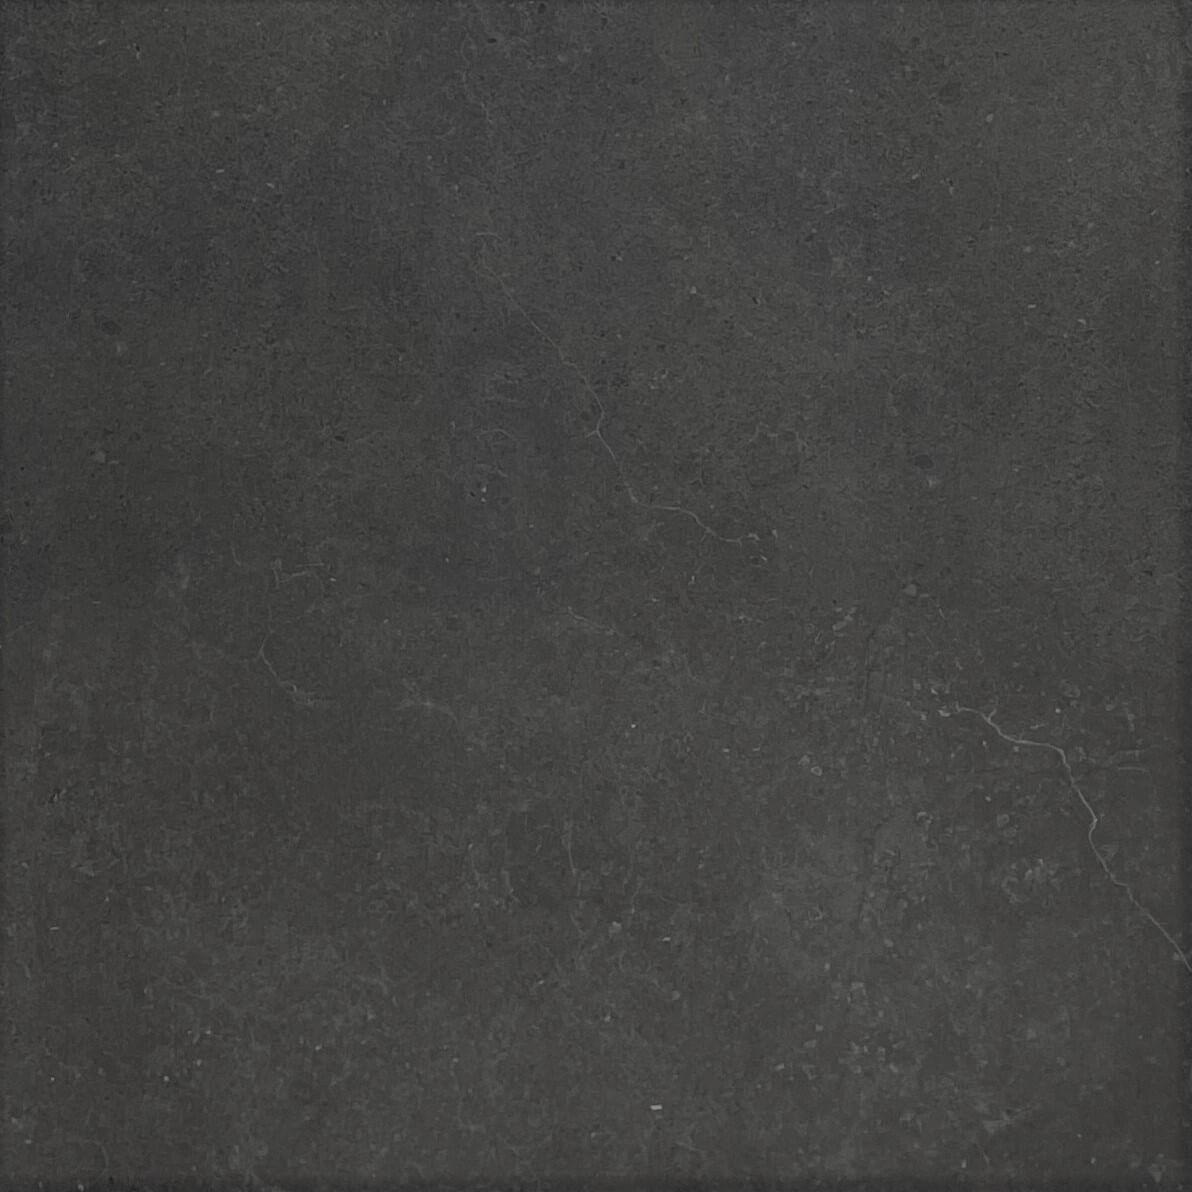 Trafalgar Black Matt Rectified Porcelain Tile 3802